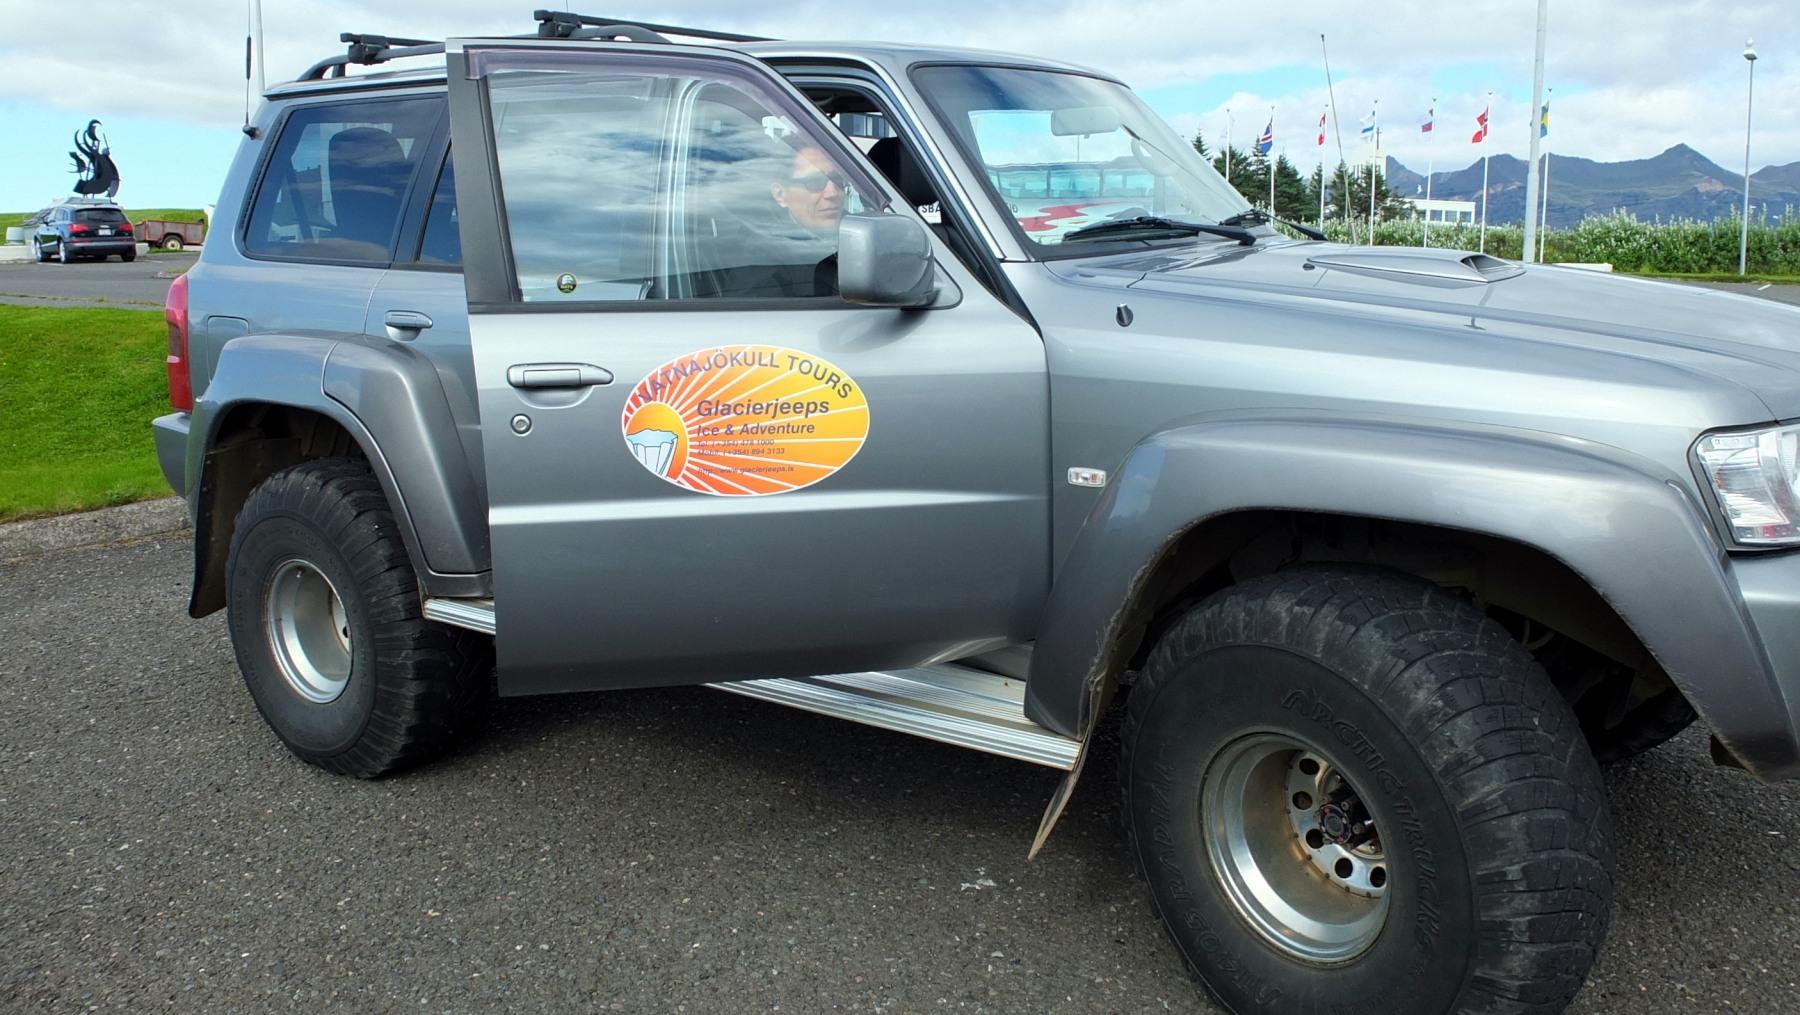 Iceland 000-748.JPG